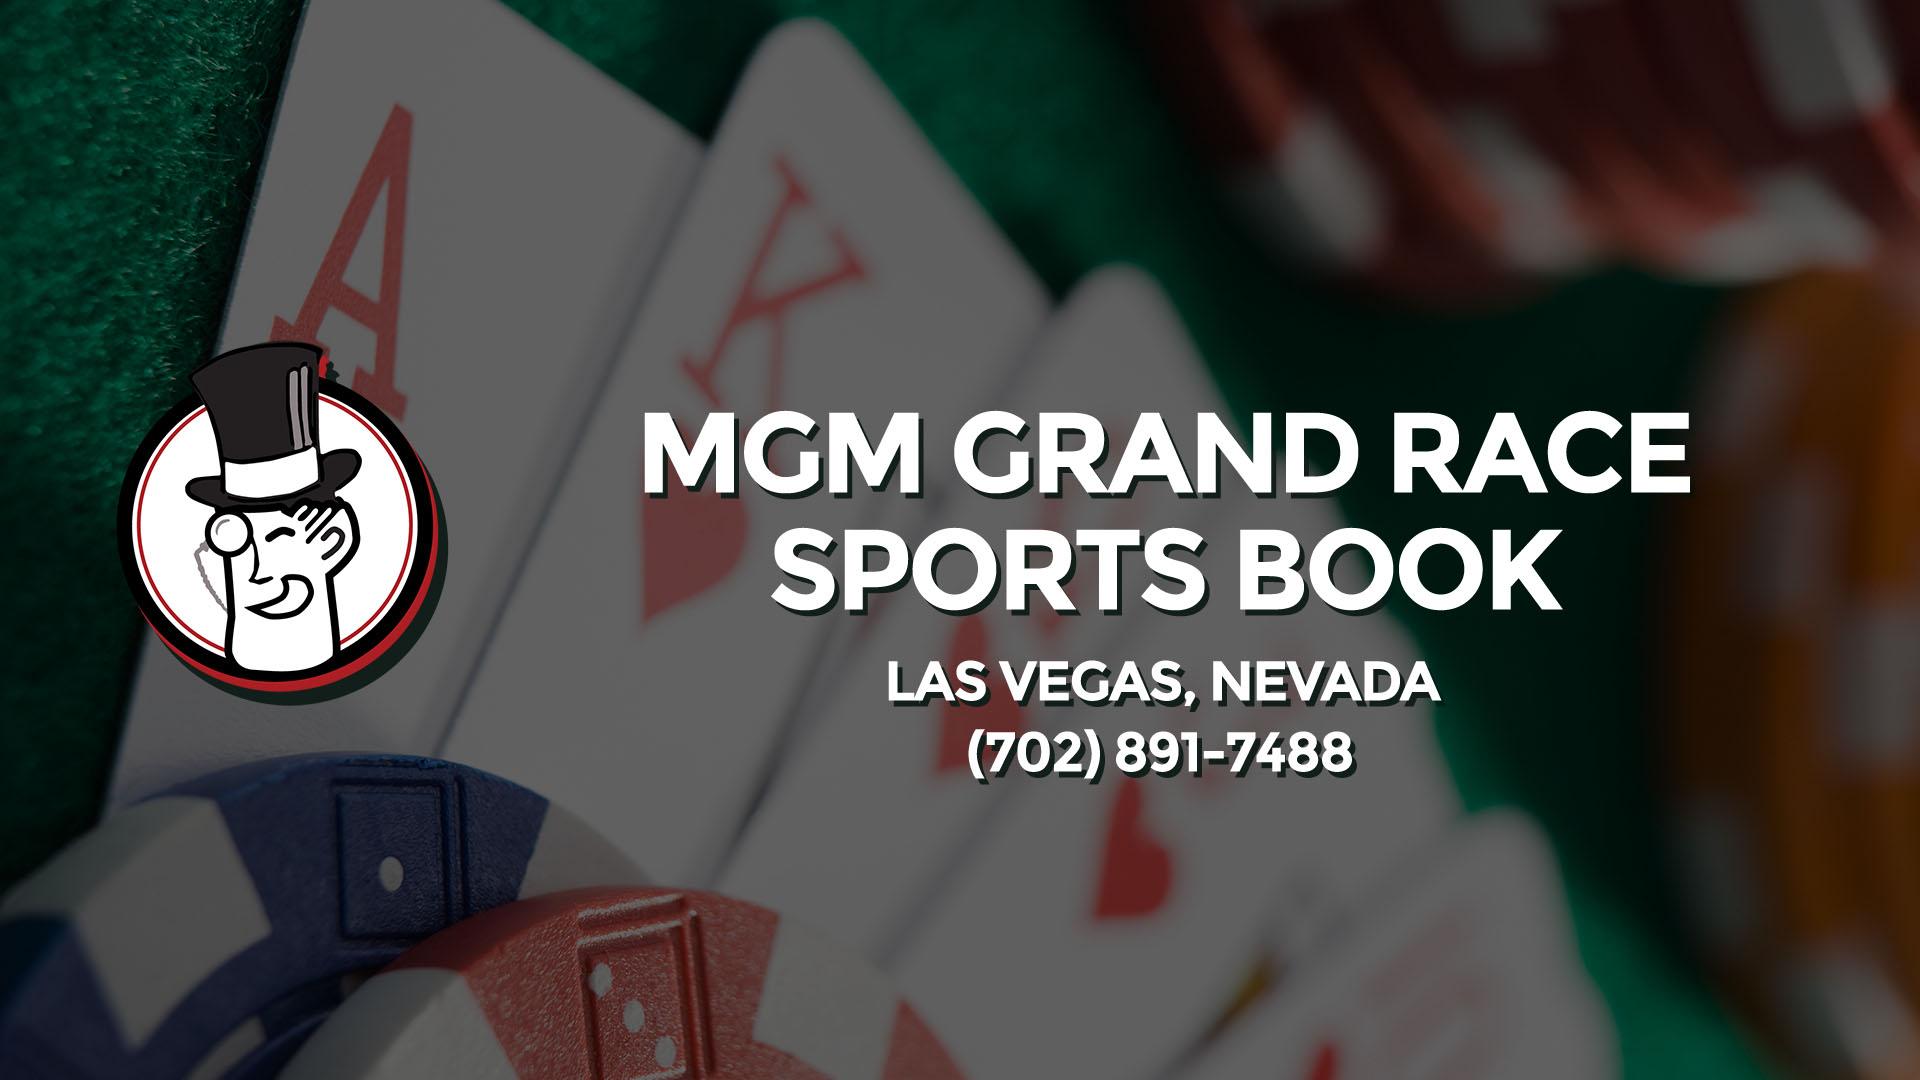 MGM GRAND RACE  SPORTS BOOK LAS VEGAS NV